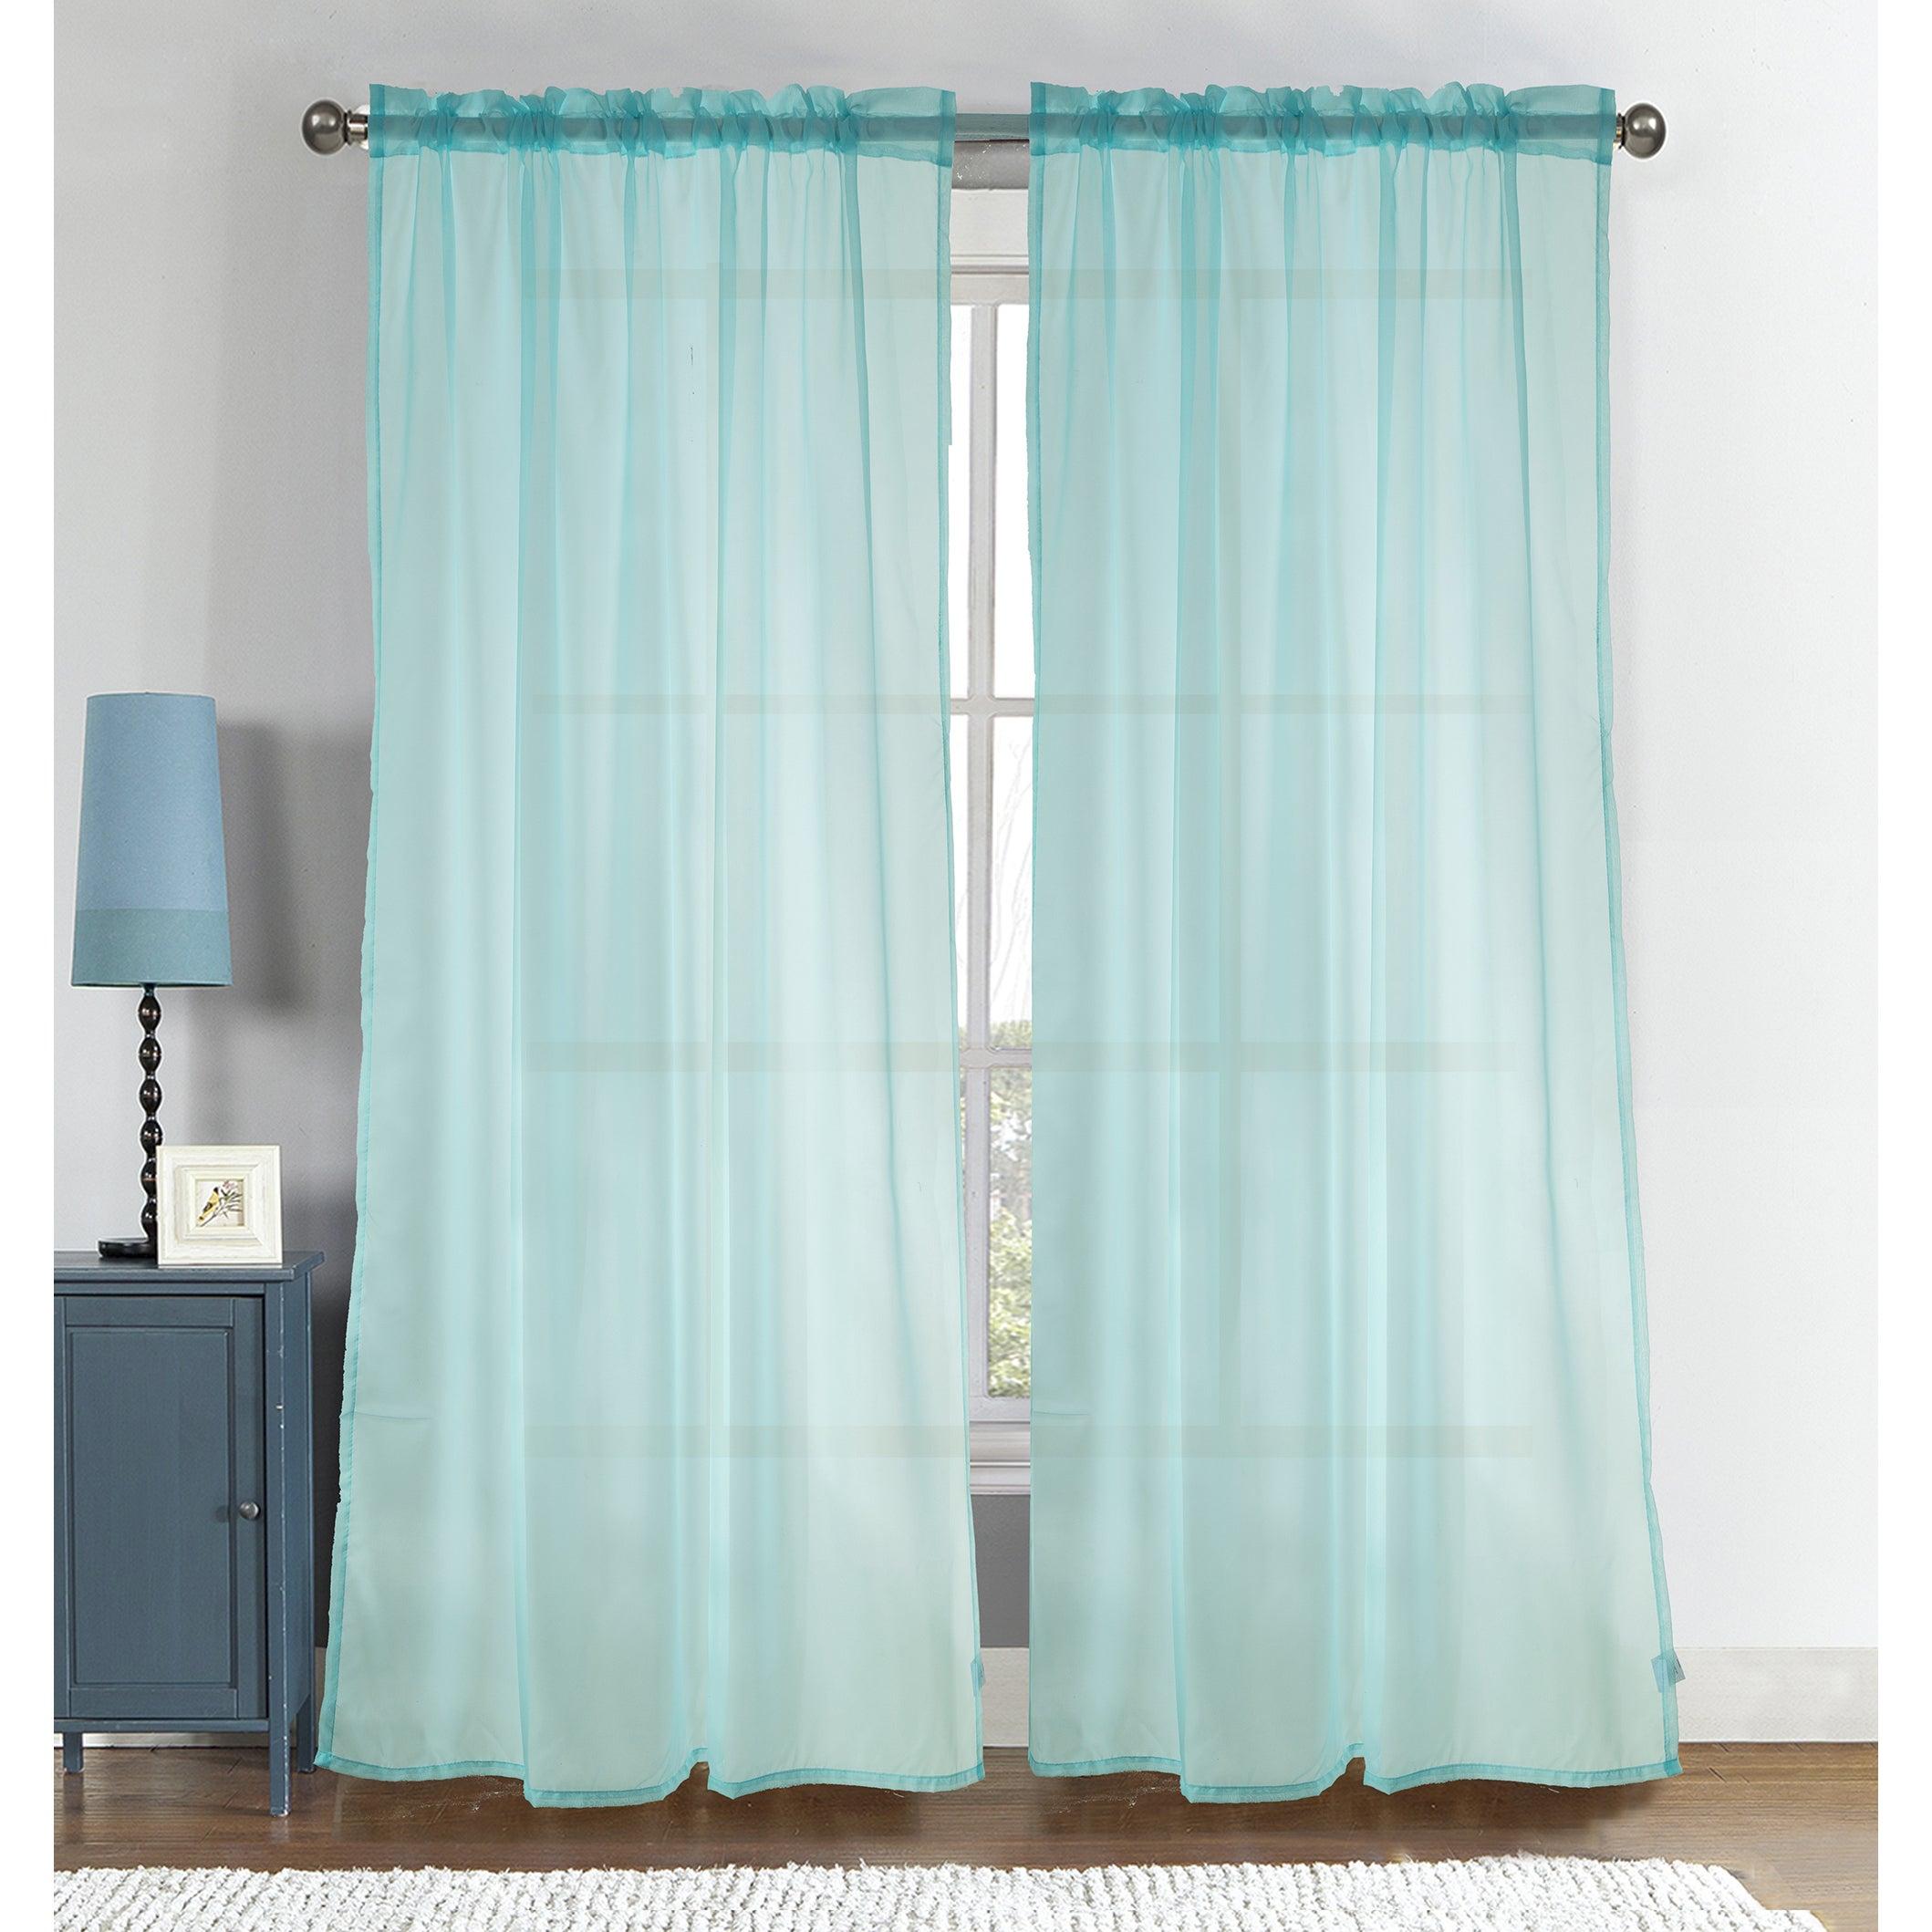 Ottomanson Sheer 84 Inch Rod Pocket Top Curtain Panel Pai...